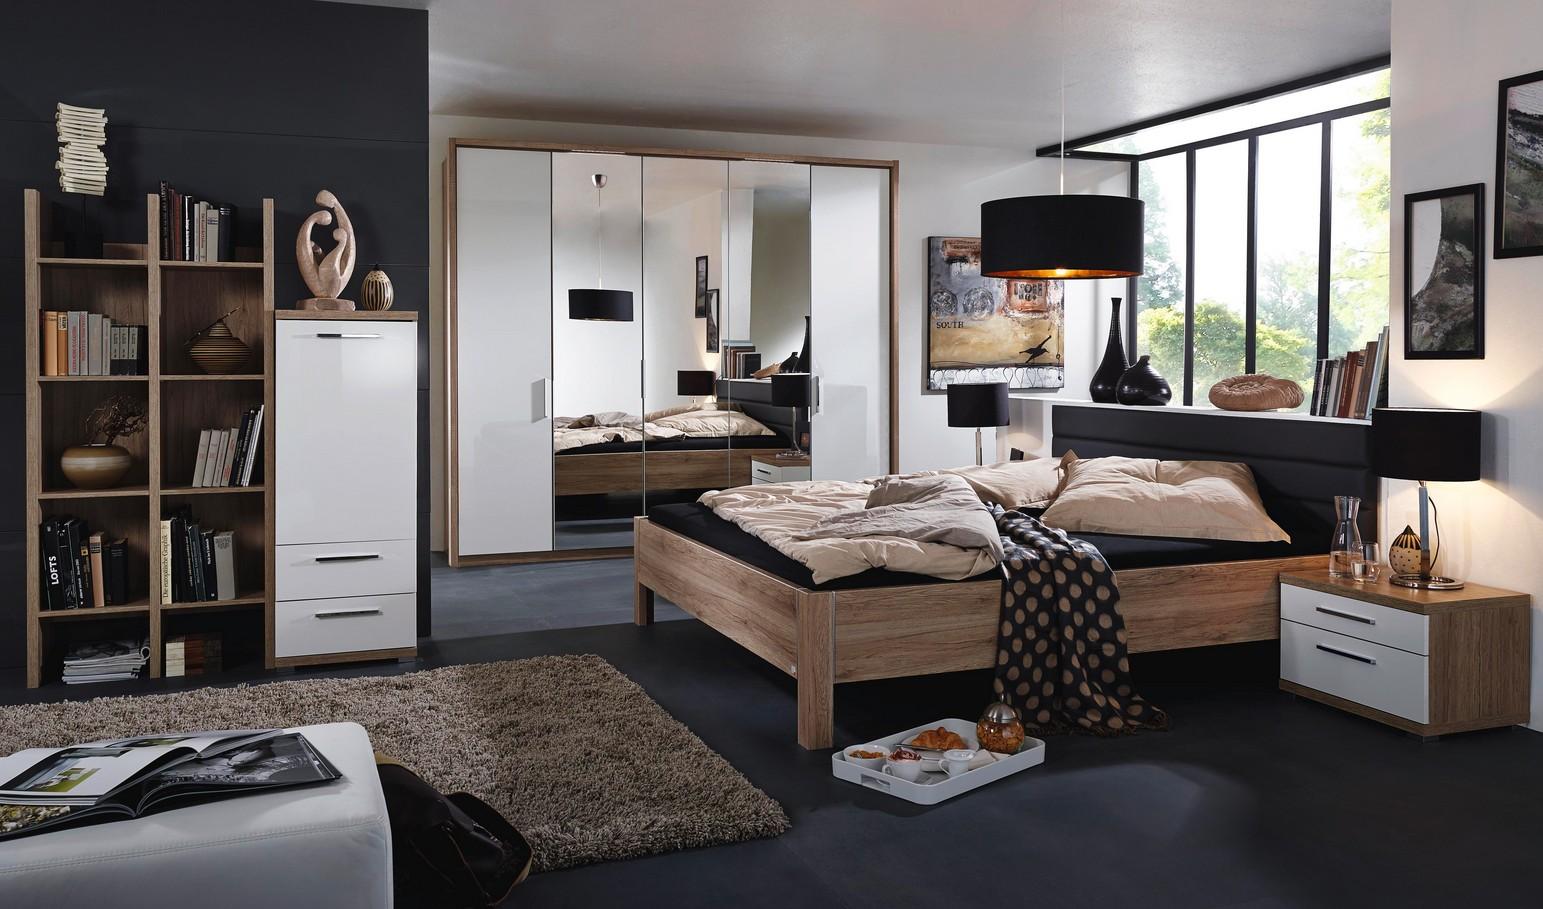 rauch dialog nice4home konfigurator komfortbett dekor g nstig kaufen m bel universum. Black Bedroom Furniture Sets. Home Design Ideas